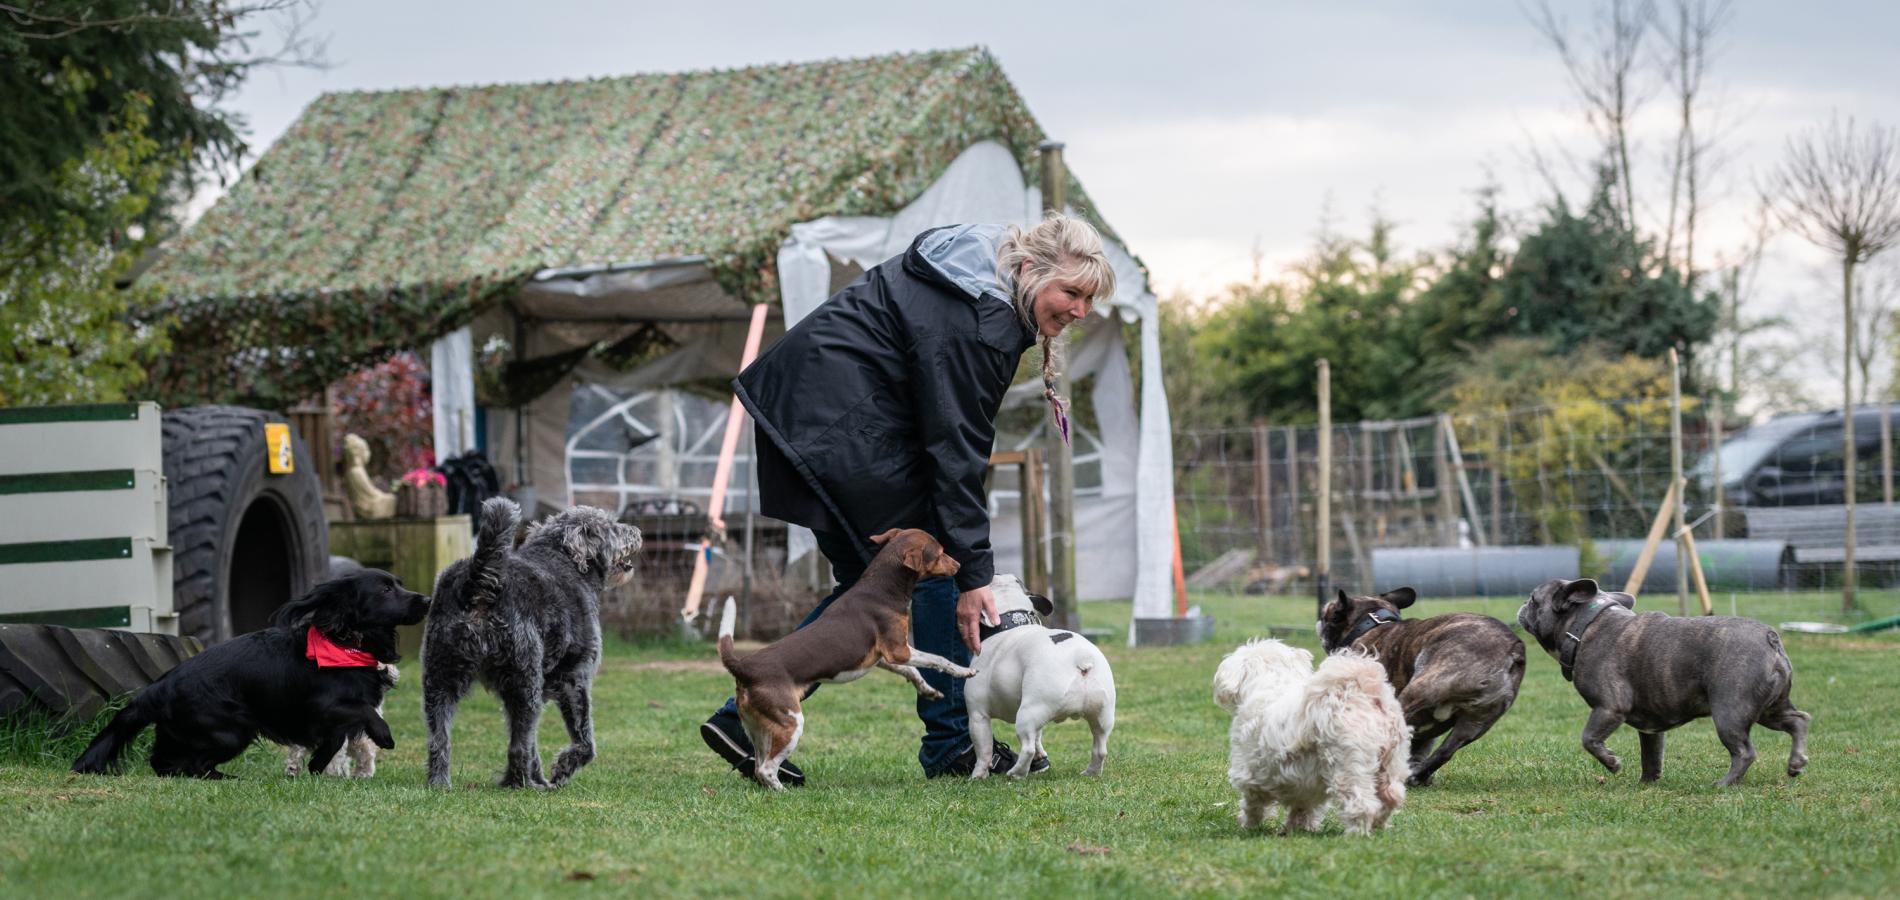 Hundeschule Goch - Zu jedem Hund ein individuell angepasstes Training